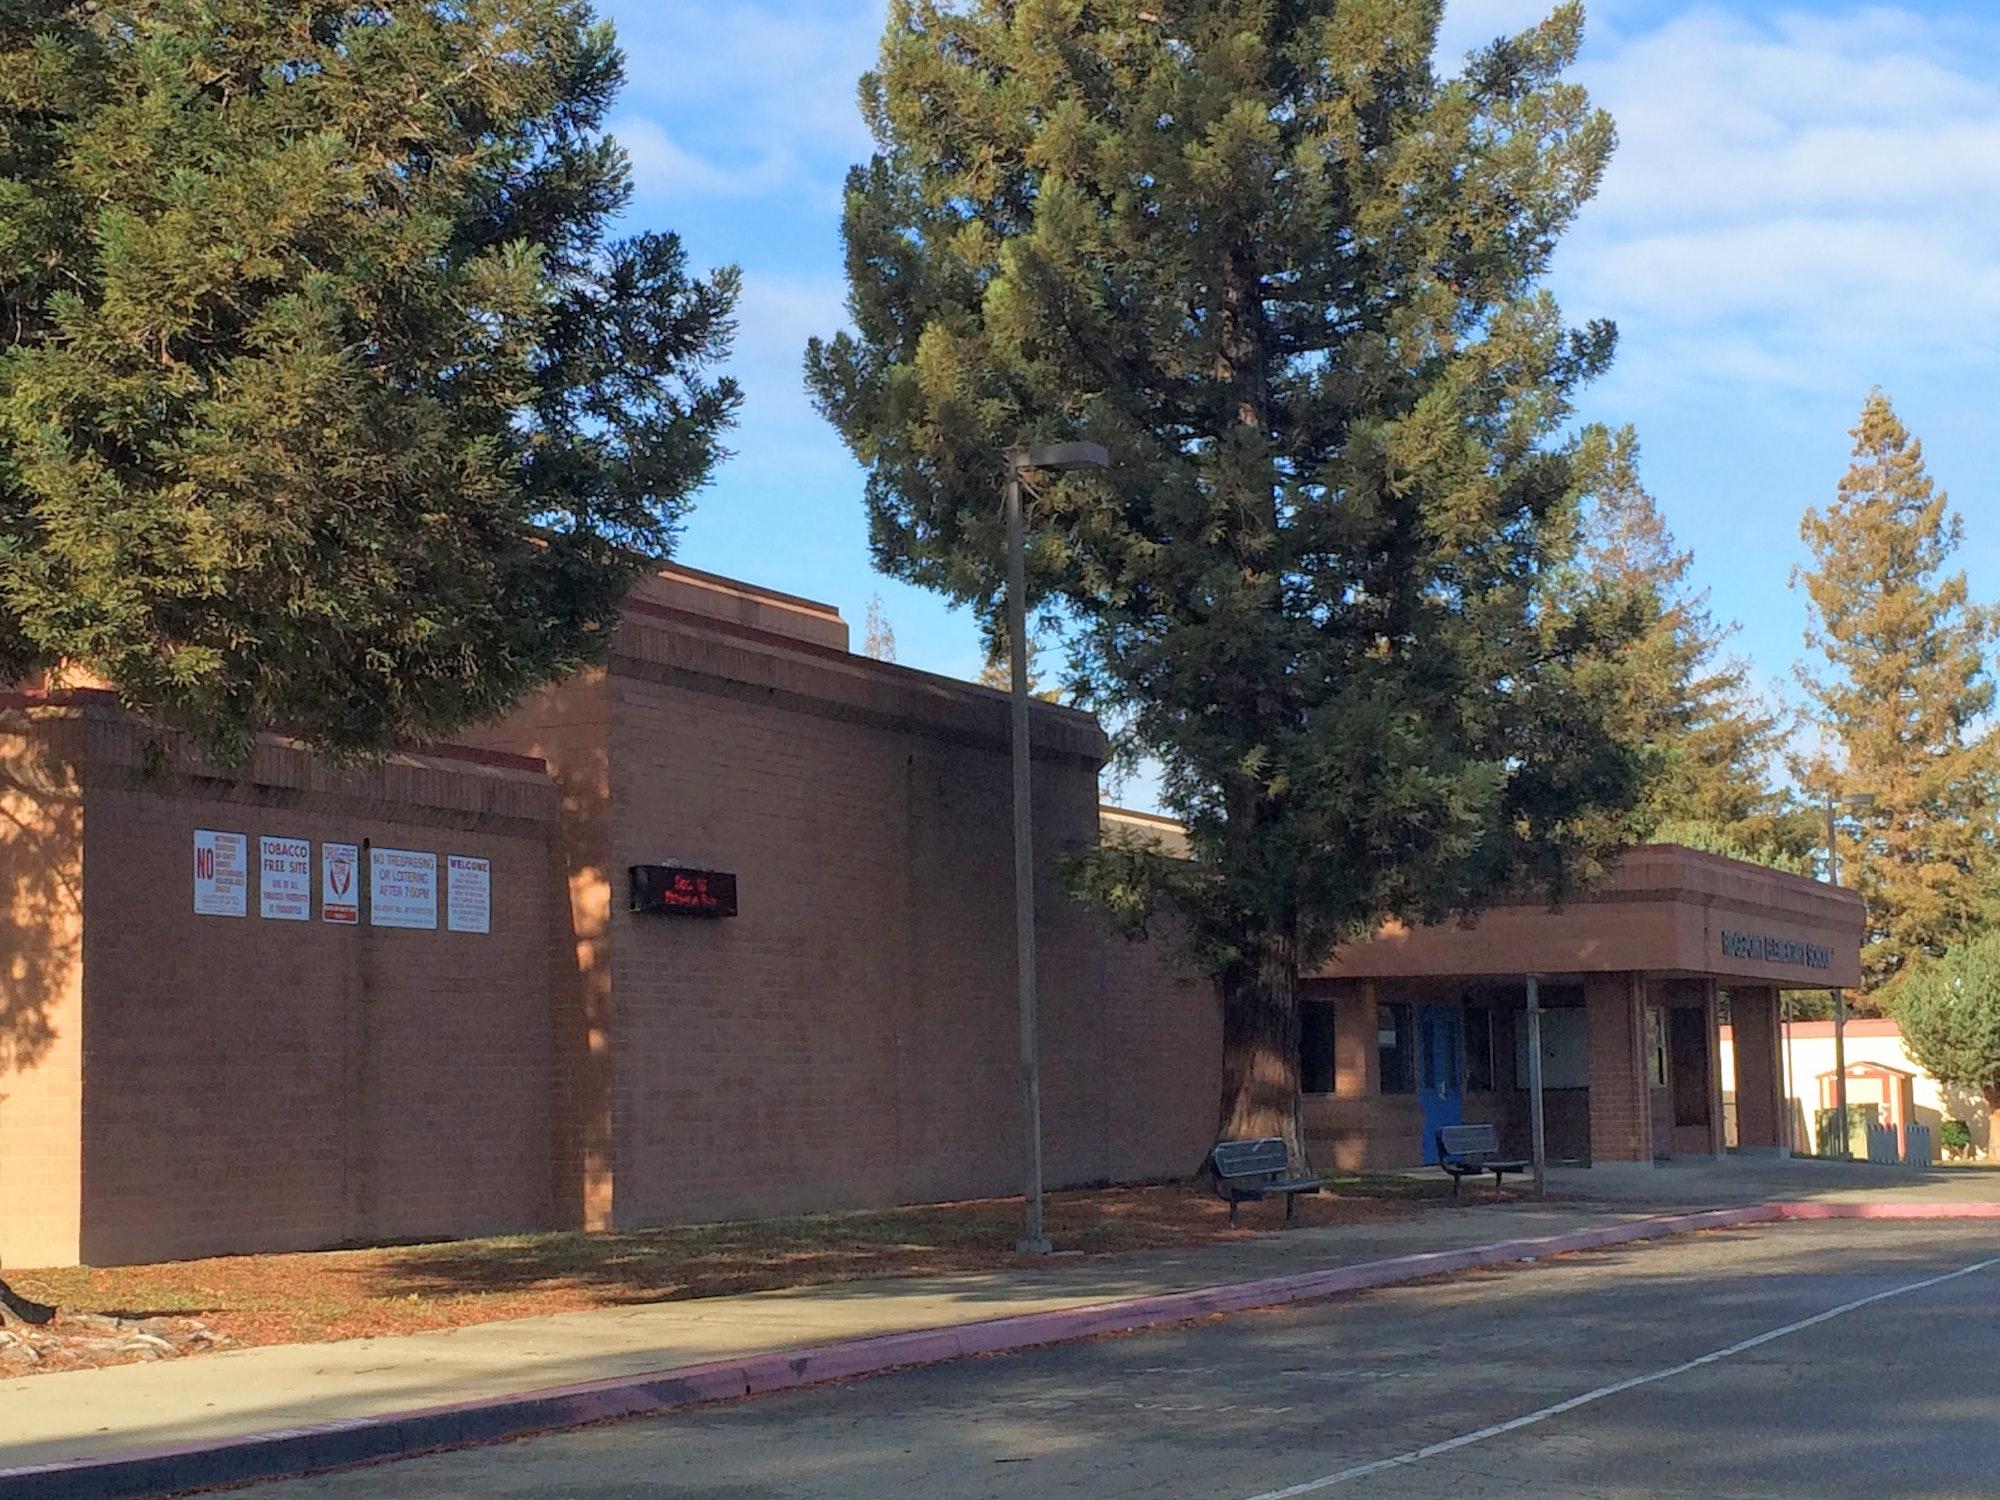 Ridgepoint Elementary School